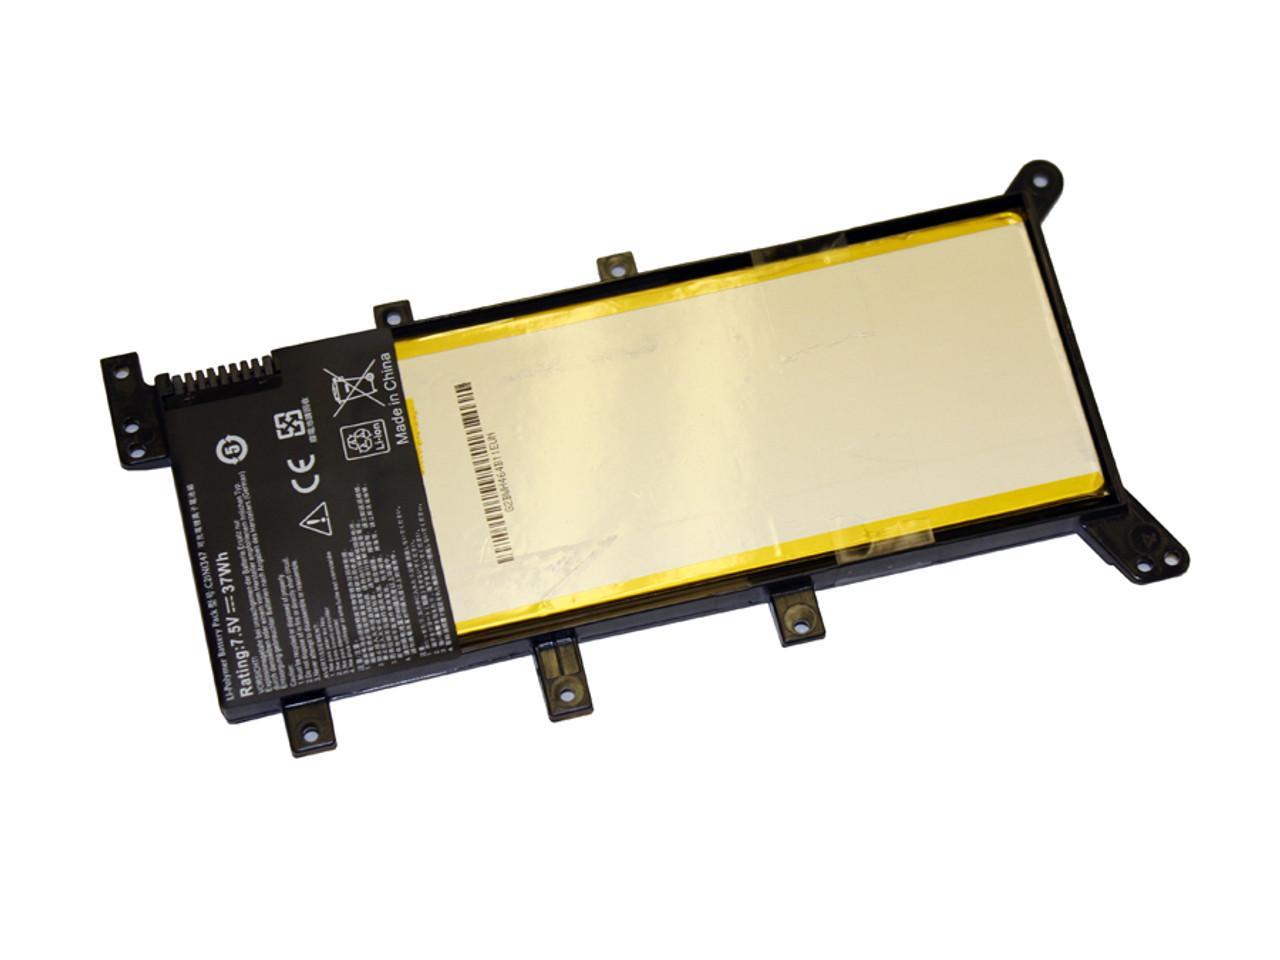 Replacement Battery for ASUS  A555, A556, F550, F554, F555, K555, R556, R557, X555